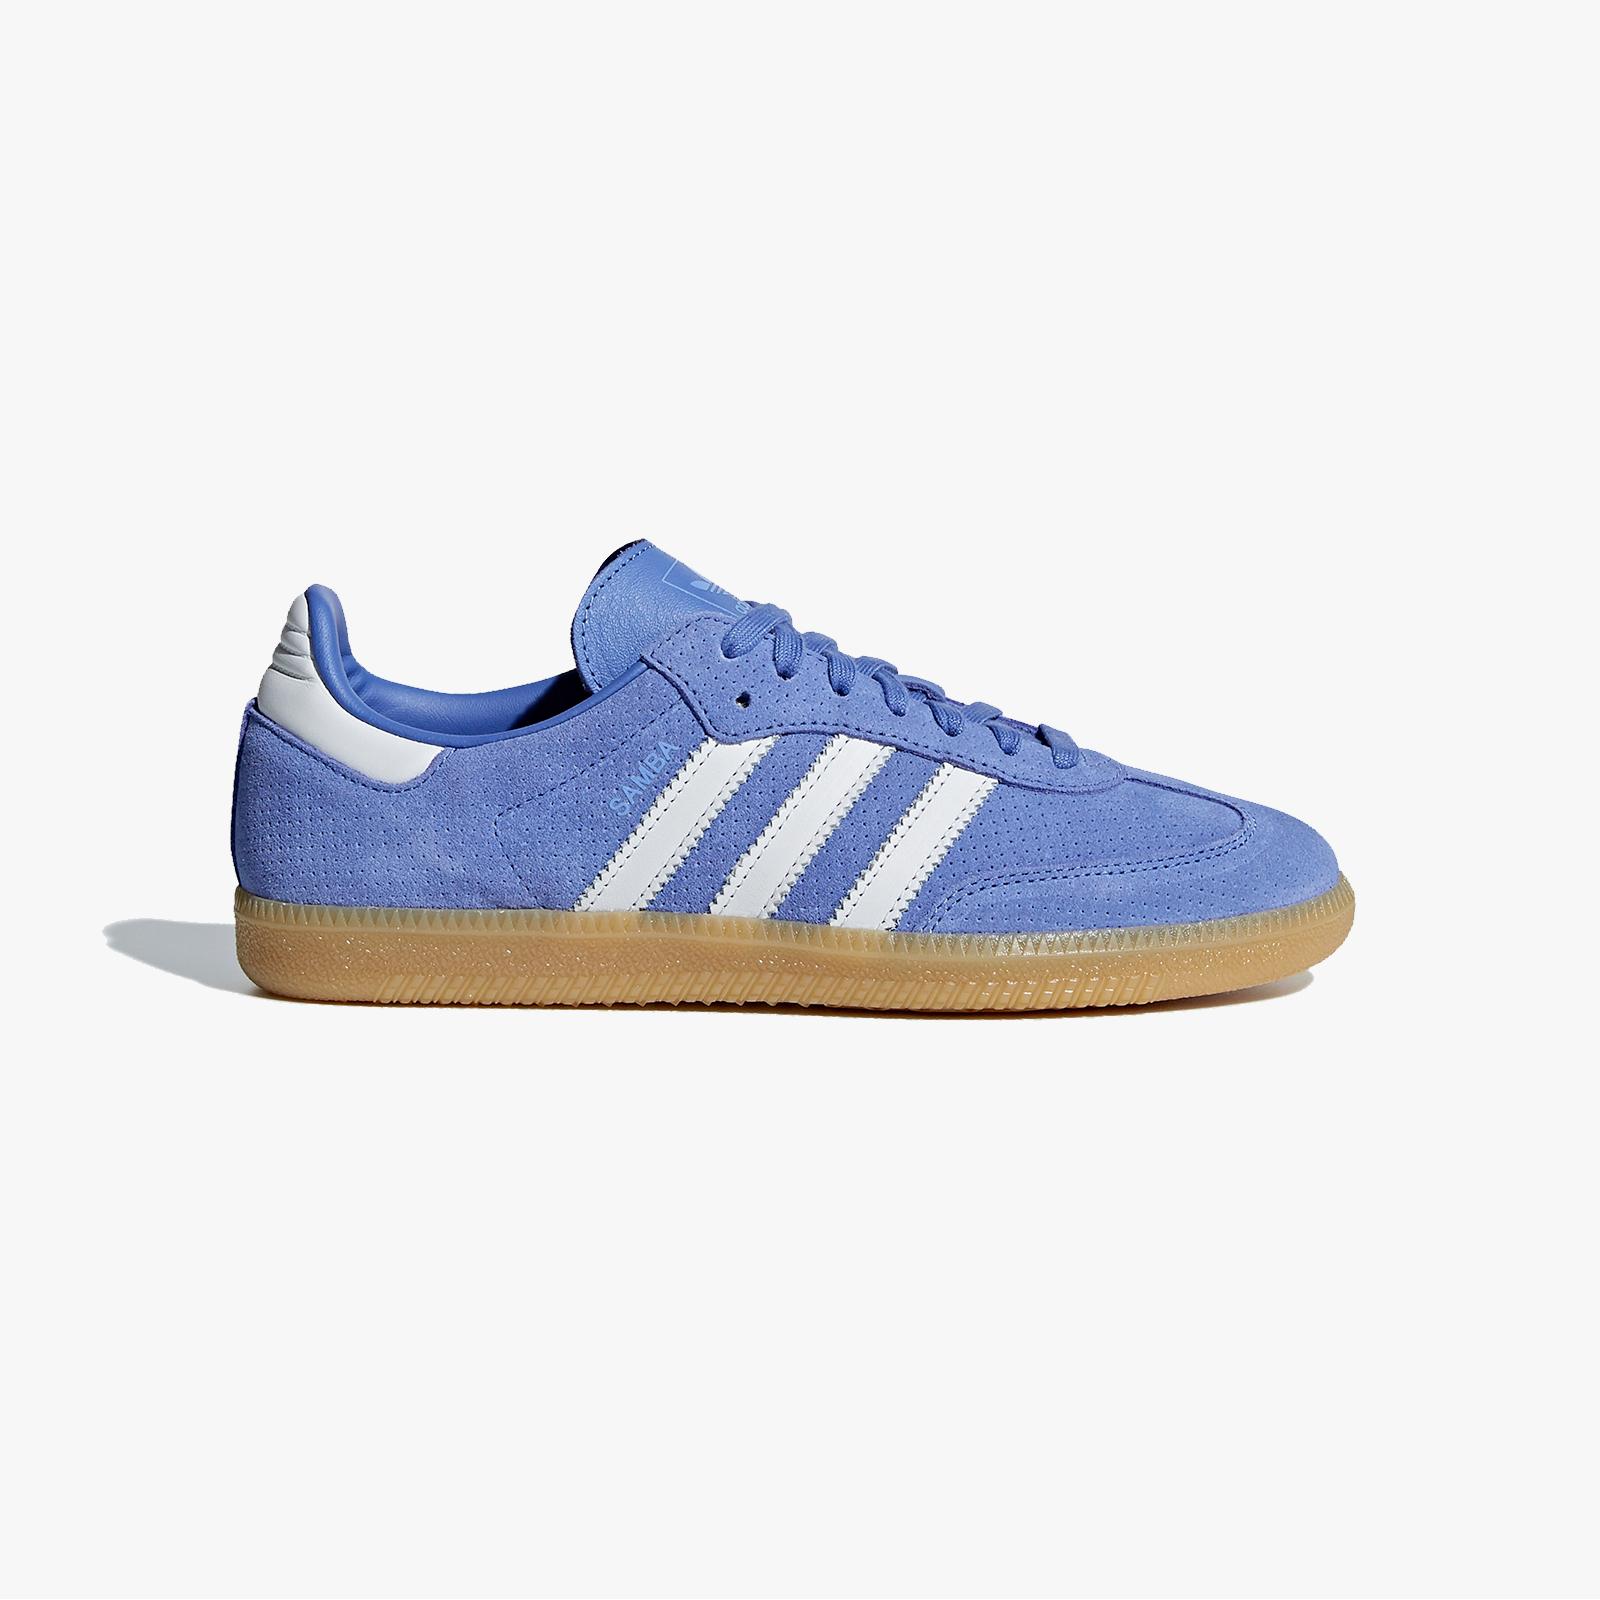 28f9f26564 uk adidas samba og w schuhe d97c3 dba87; shop adidas originals samba og w  028c6 75501